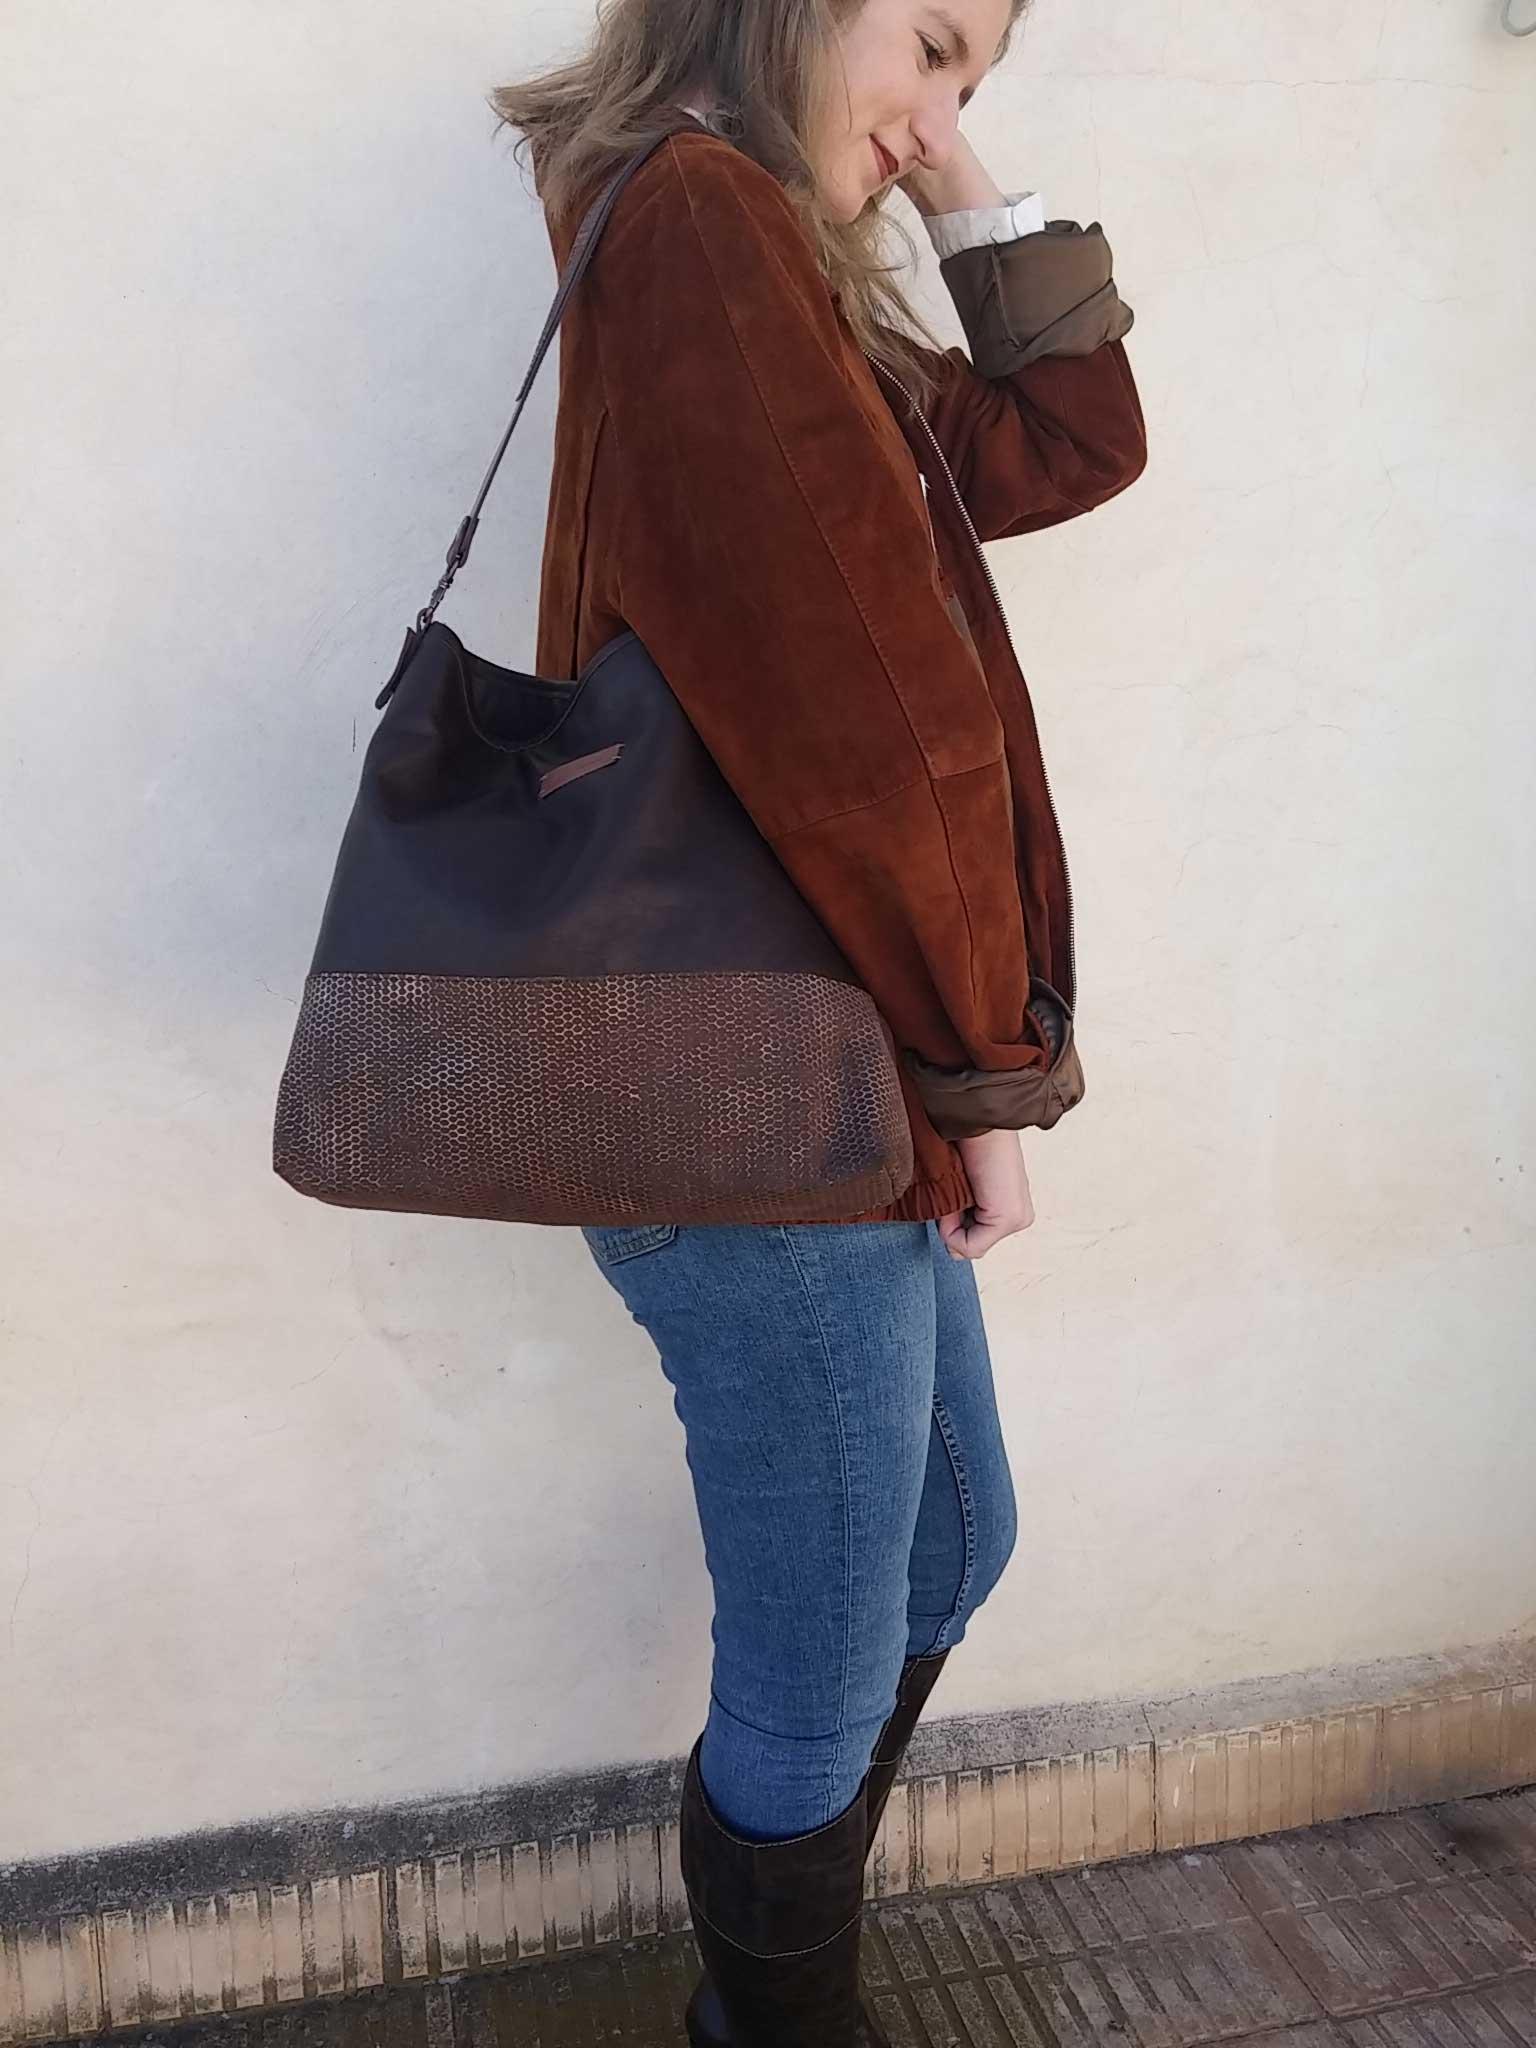 aseismanos leather hobo bag on shoulder